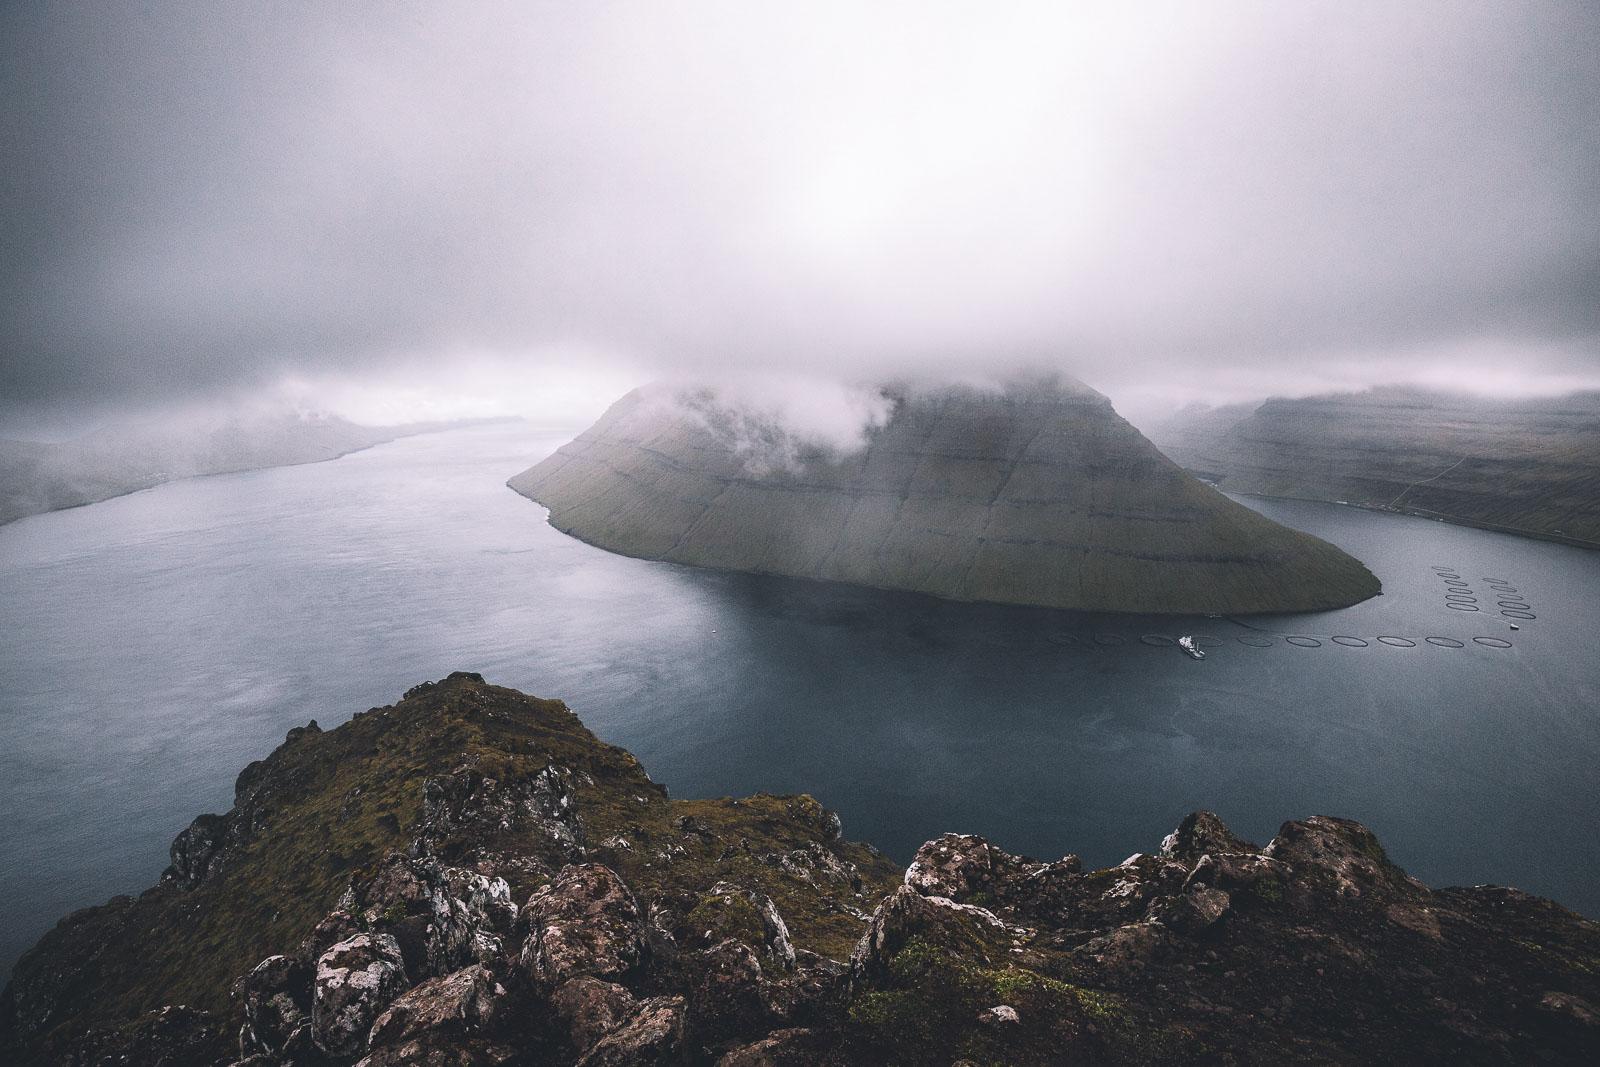 Klakkur near Klaksvik, Borðoy, Faroe Islands